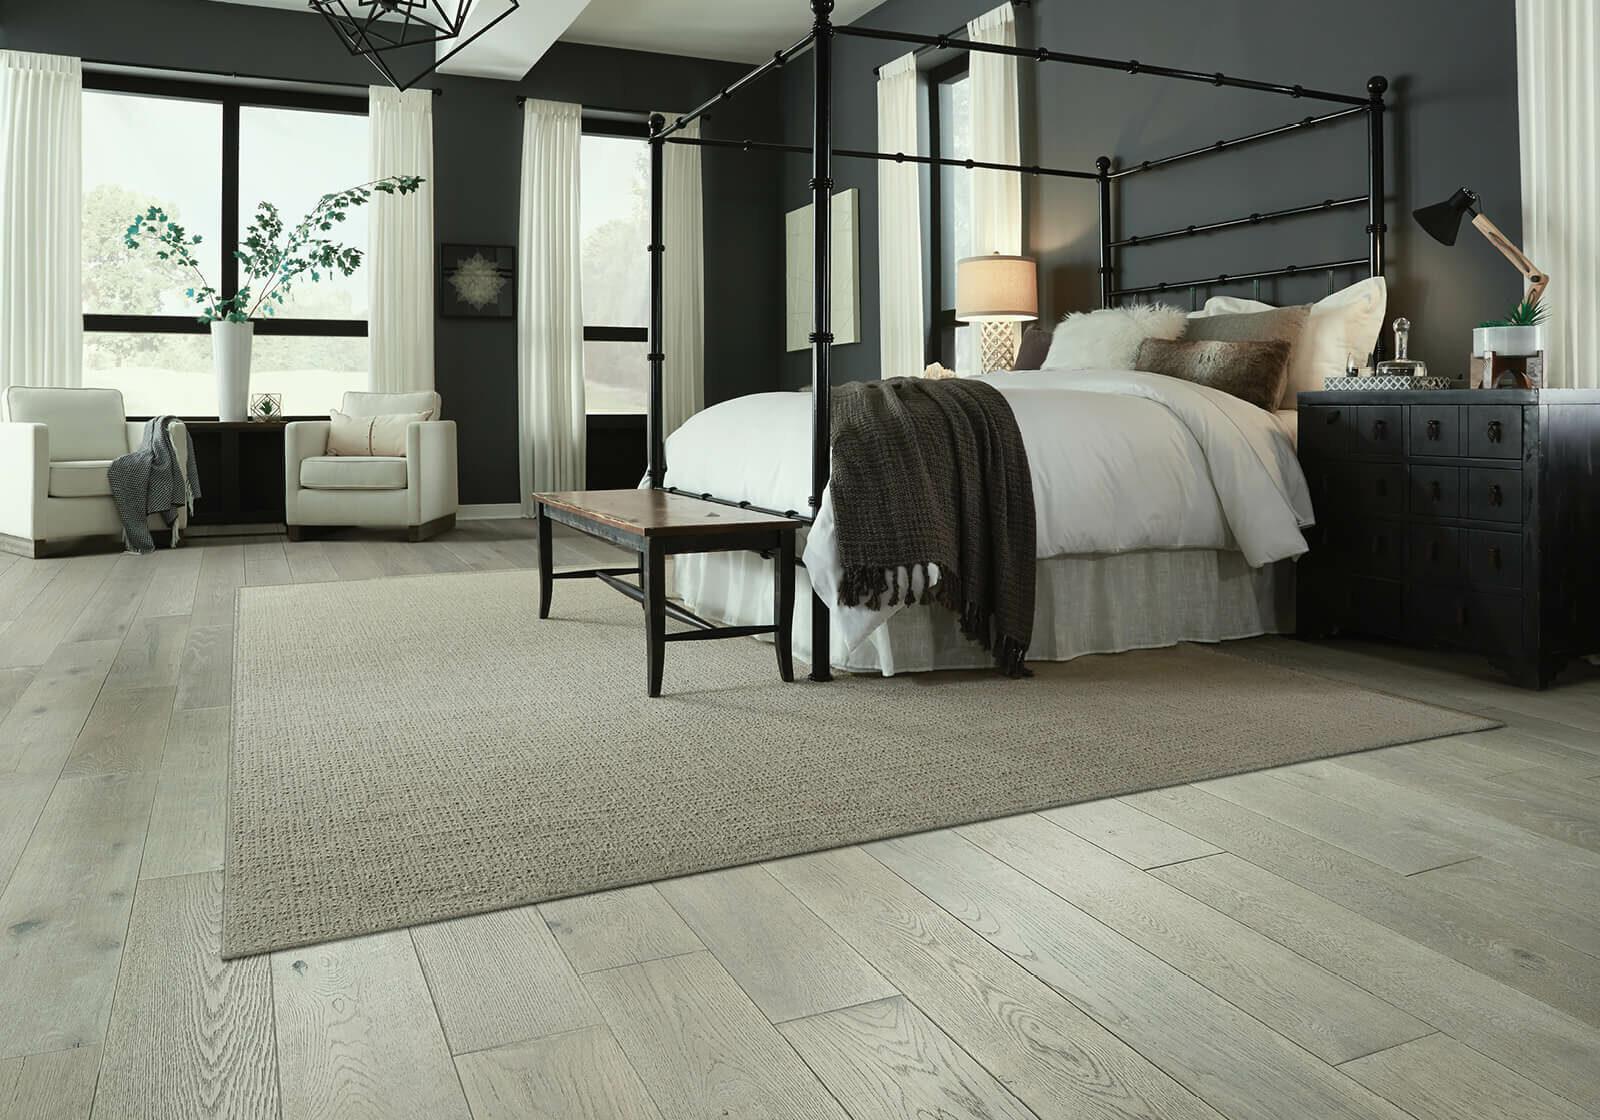 custom area rug in bedroom | Sterling Carpet Shops, Inc